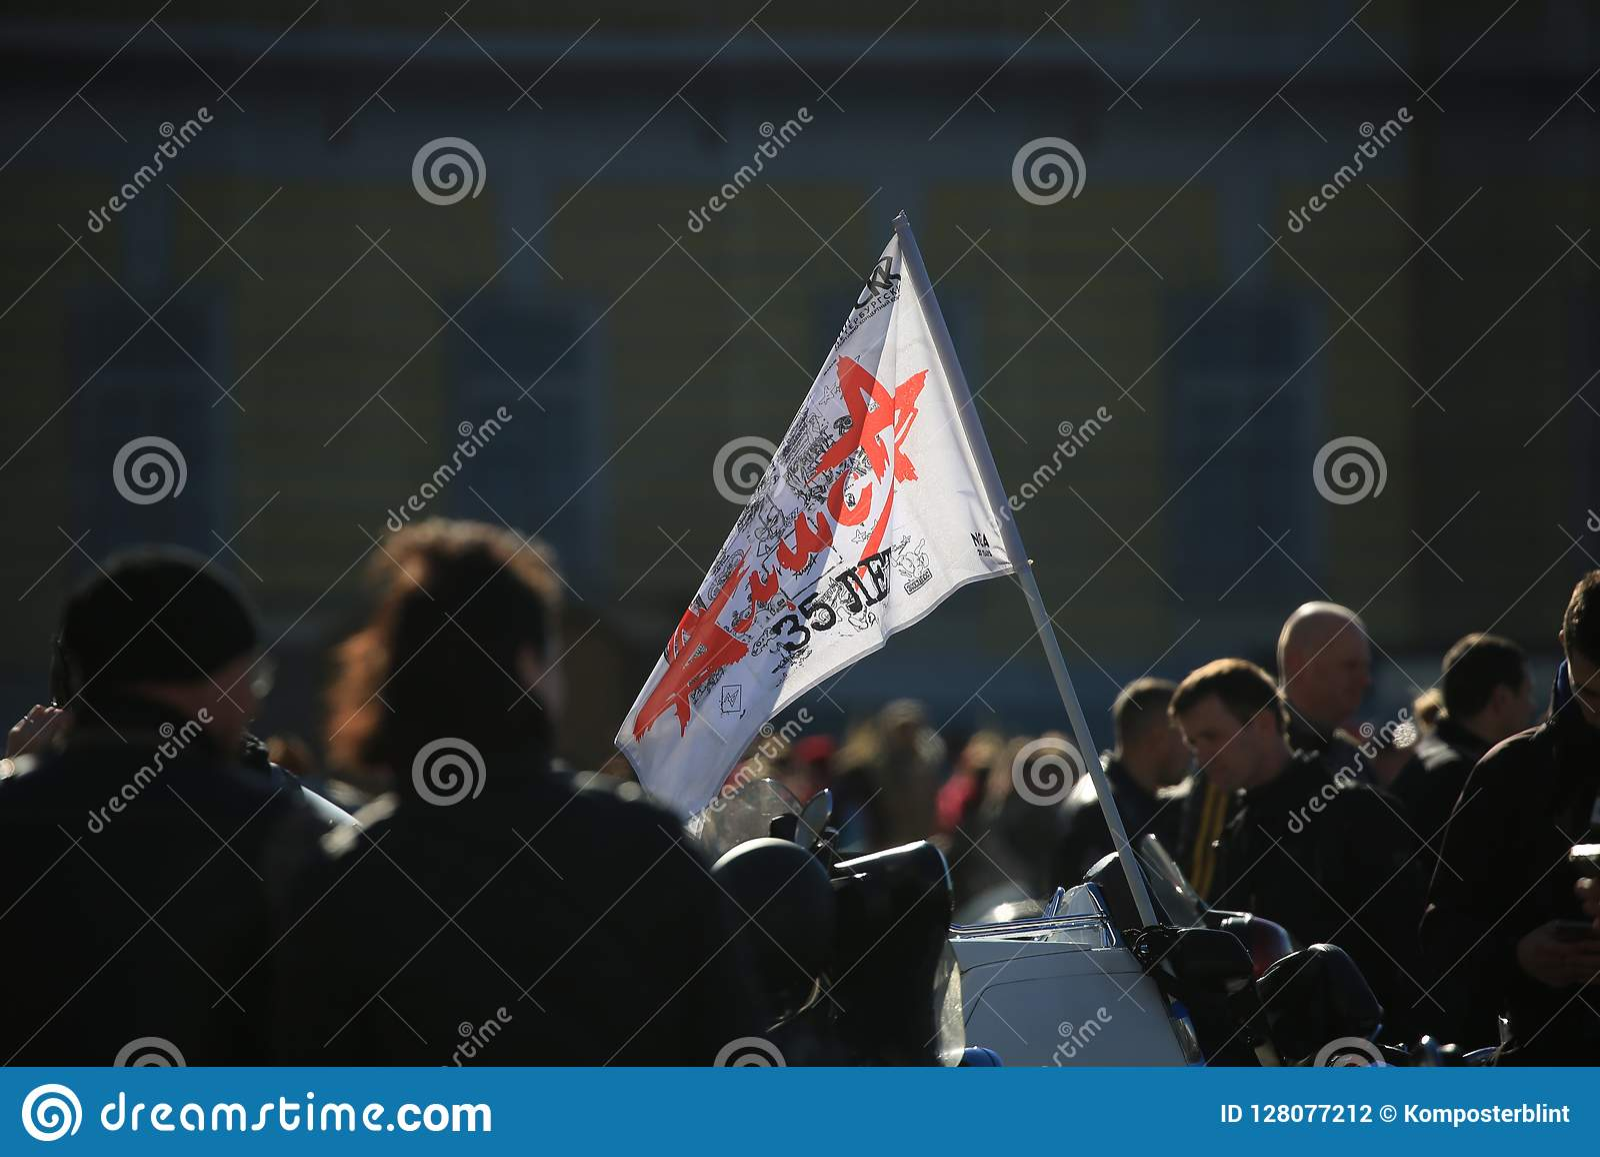 Bandiera dedicata al trentacinquesimo anniversario della banda rock sovietica e russa ALISA